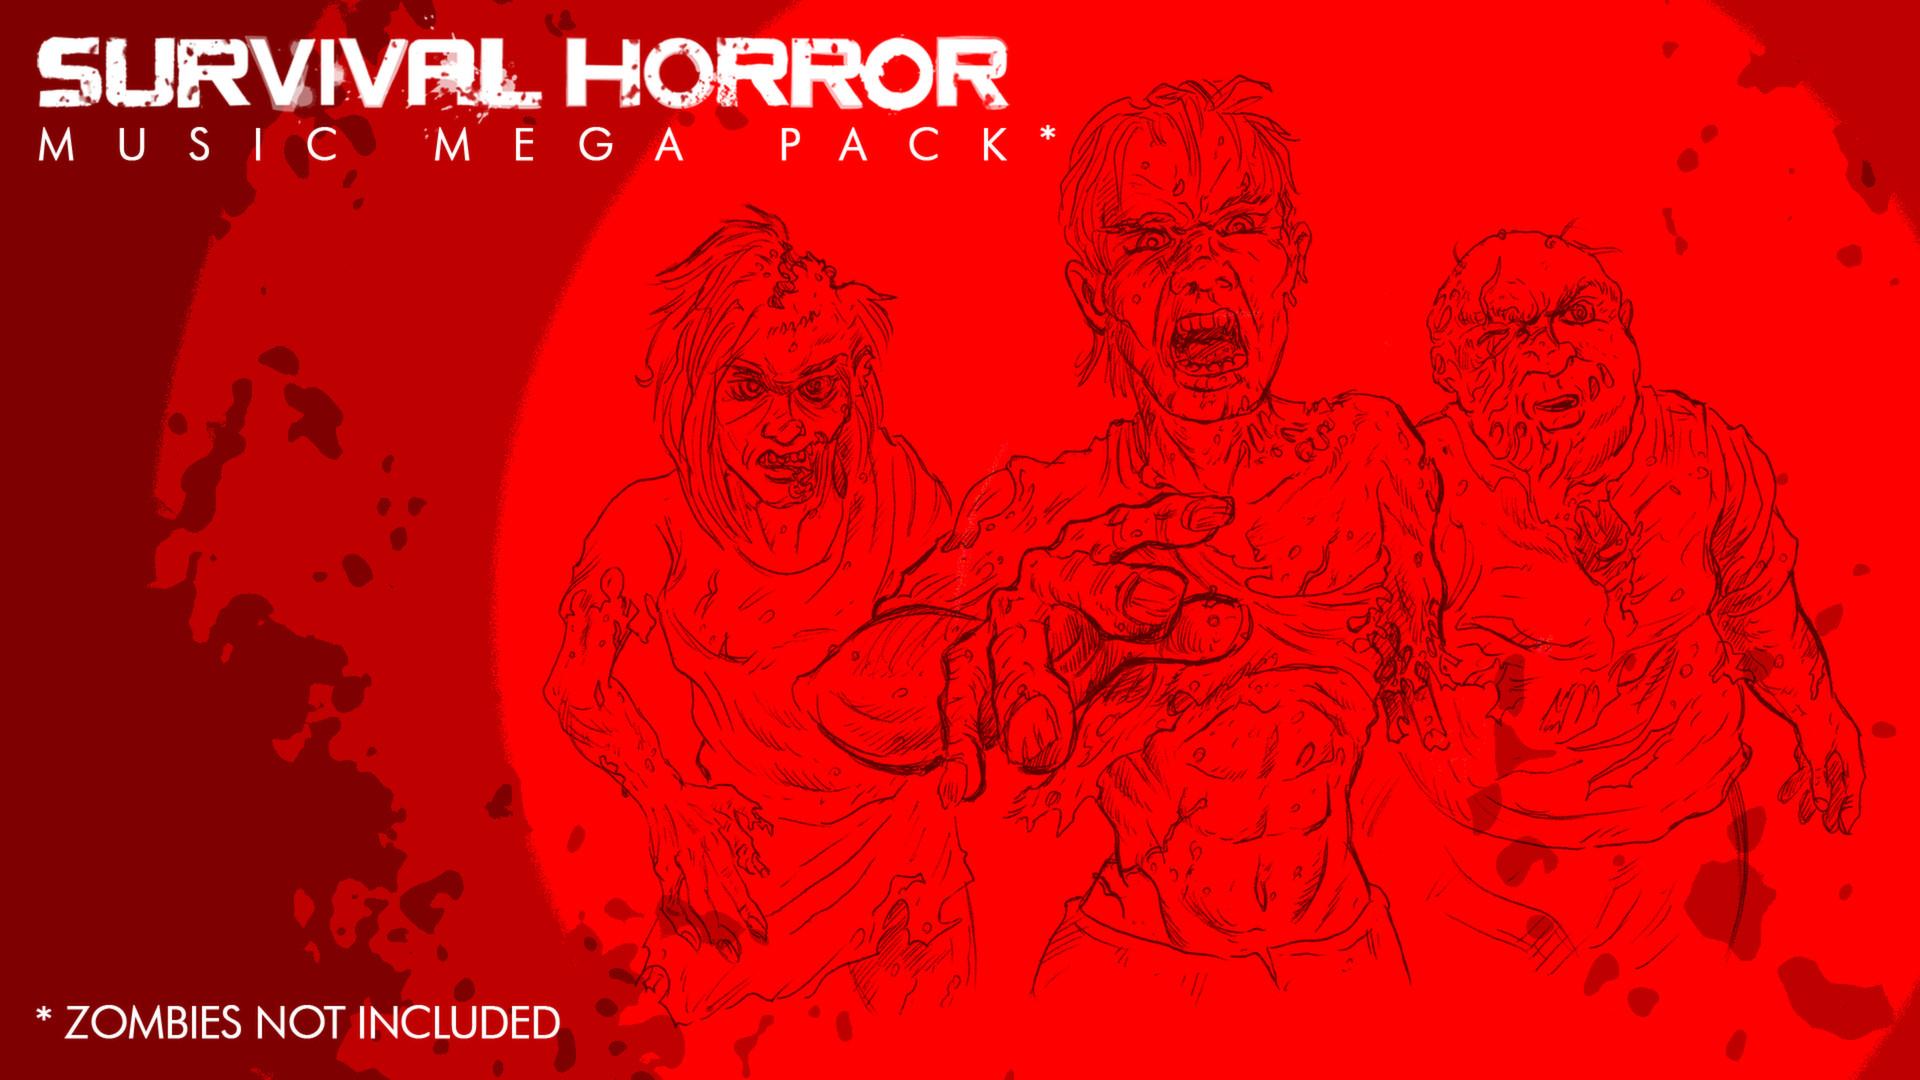 RPG Maker VX Ace - Survival Horror Music Pack screenshot